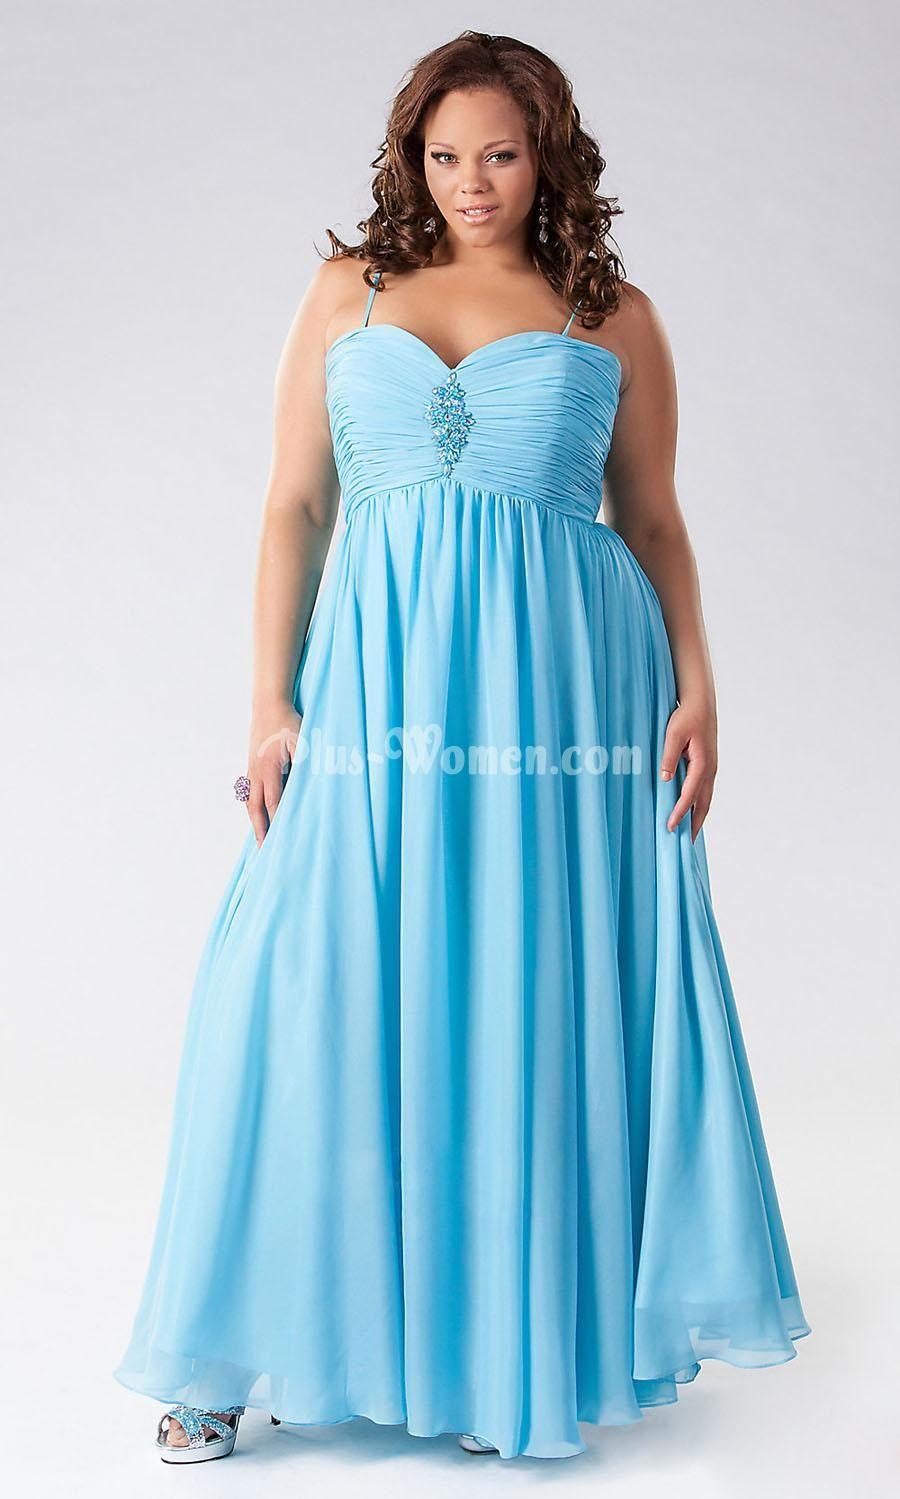 Nice Plus Size Bridesmaid Dresses Sydney Image - All Wedding Dresses ...